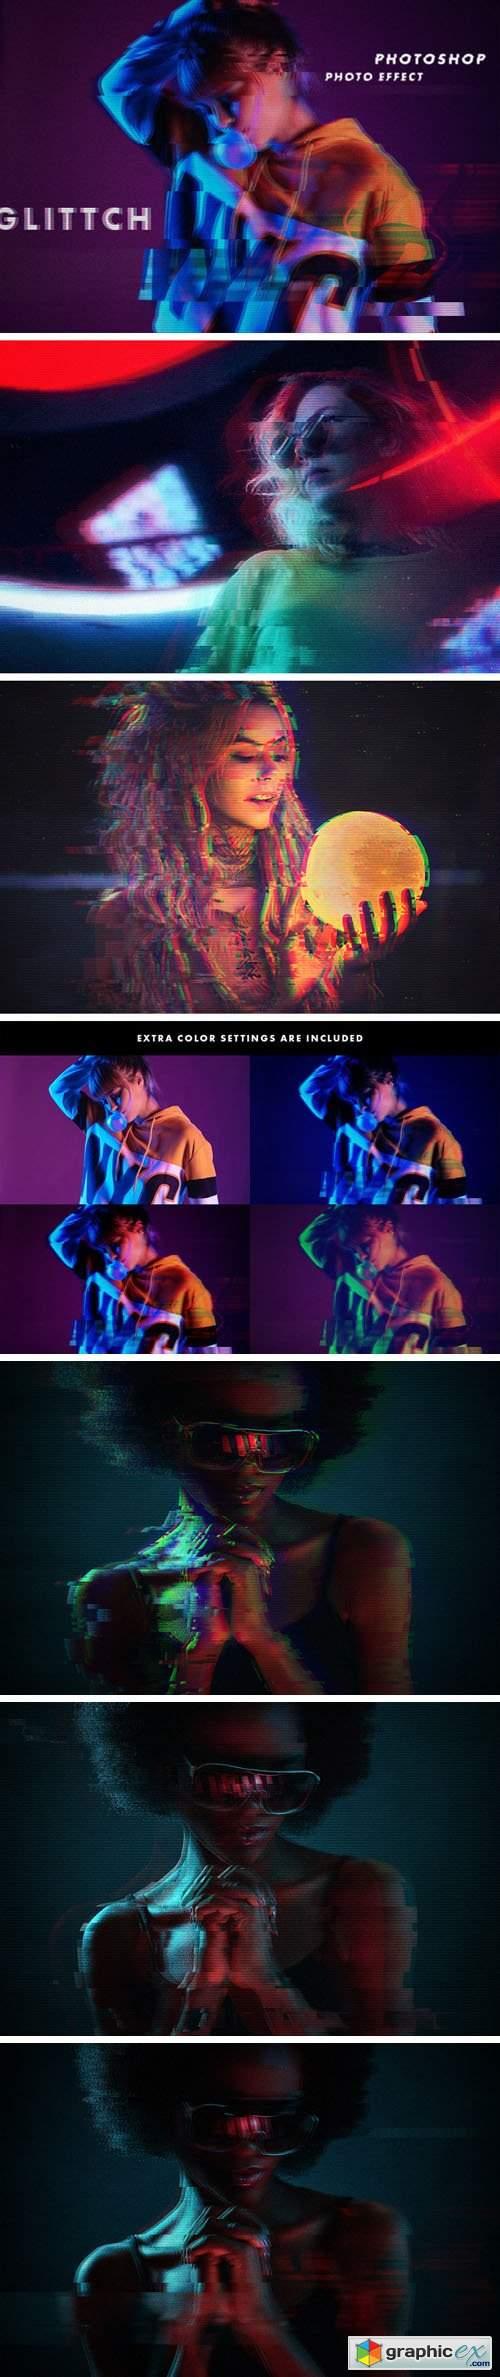 Glitch - Photoshop Photo Effects